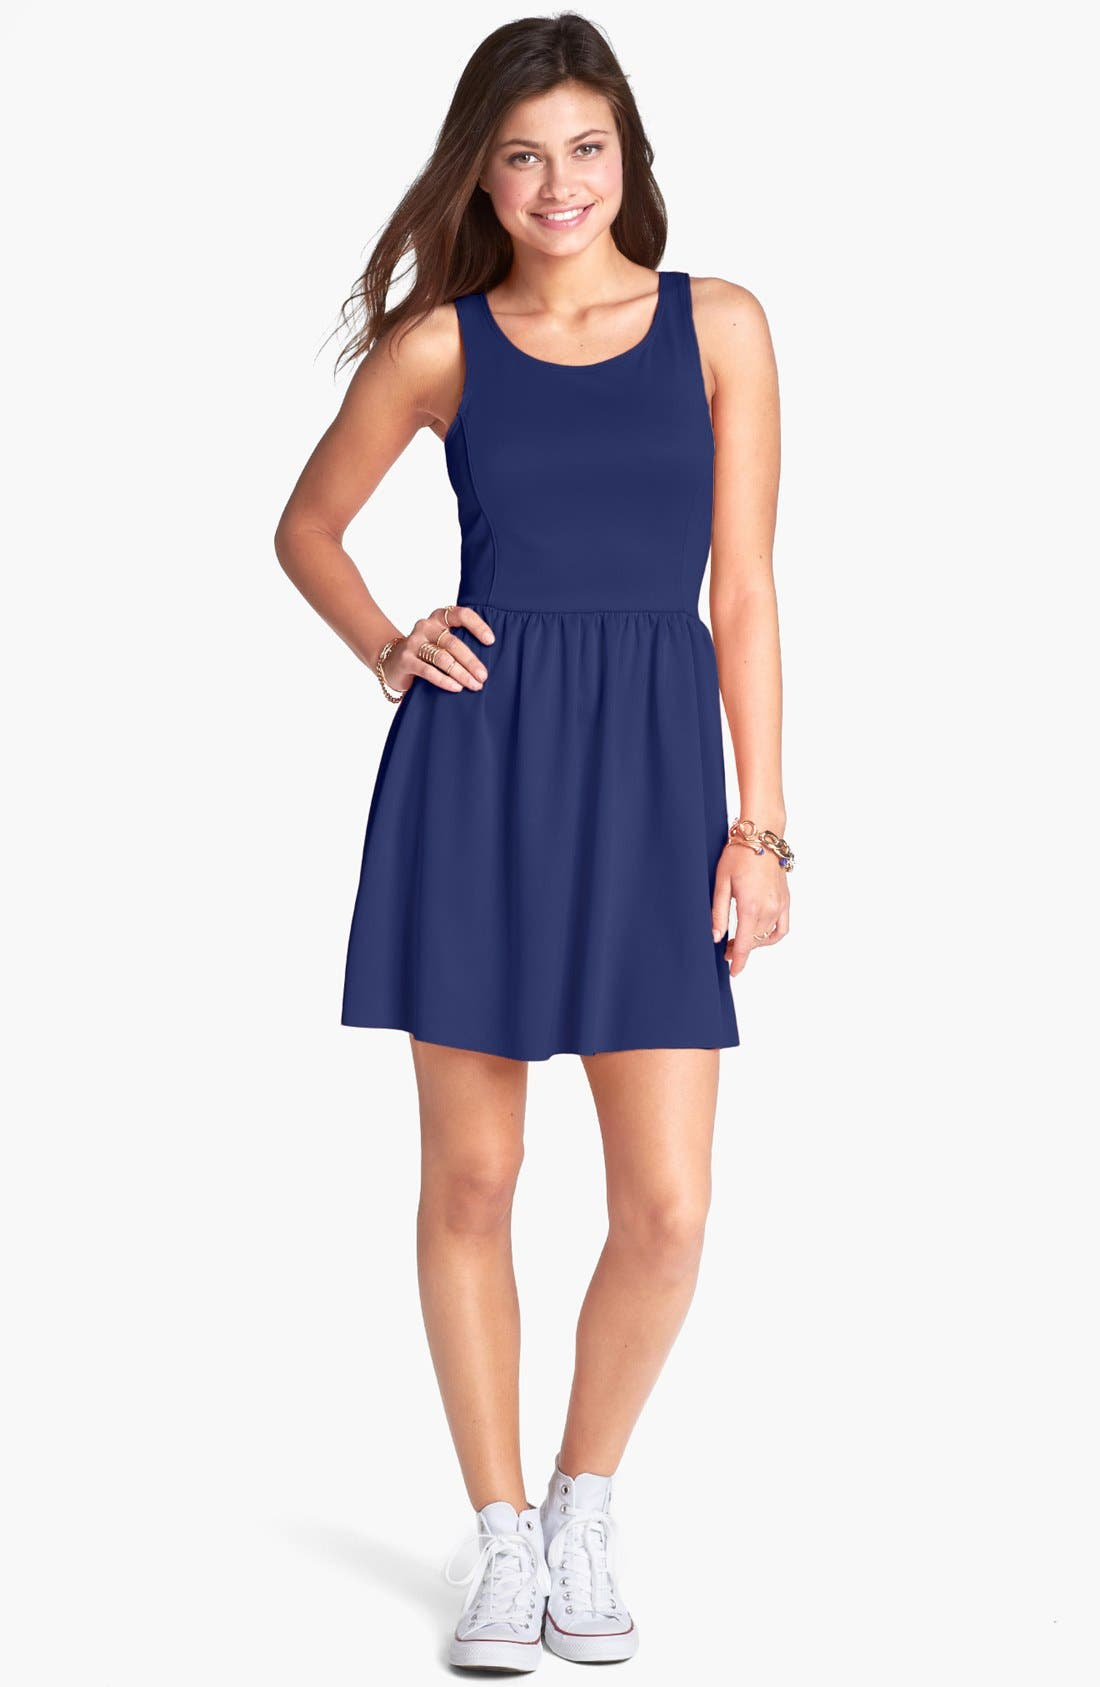 Alternate Image 1 Selected - Frenchi® Ponte Racerback Dress (Juniors)